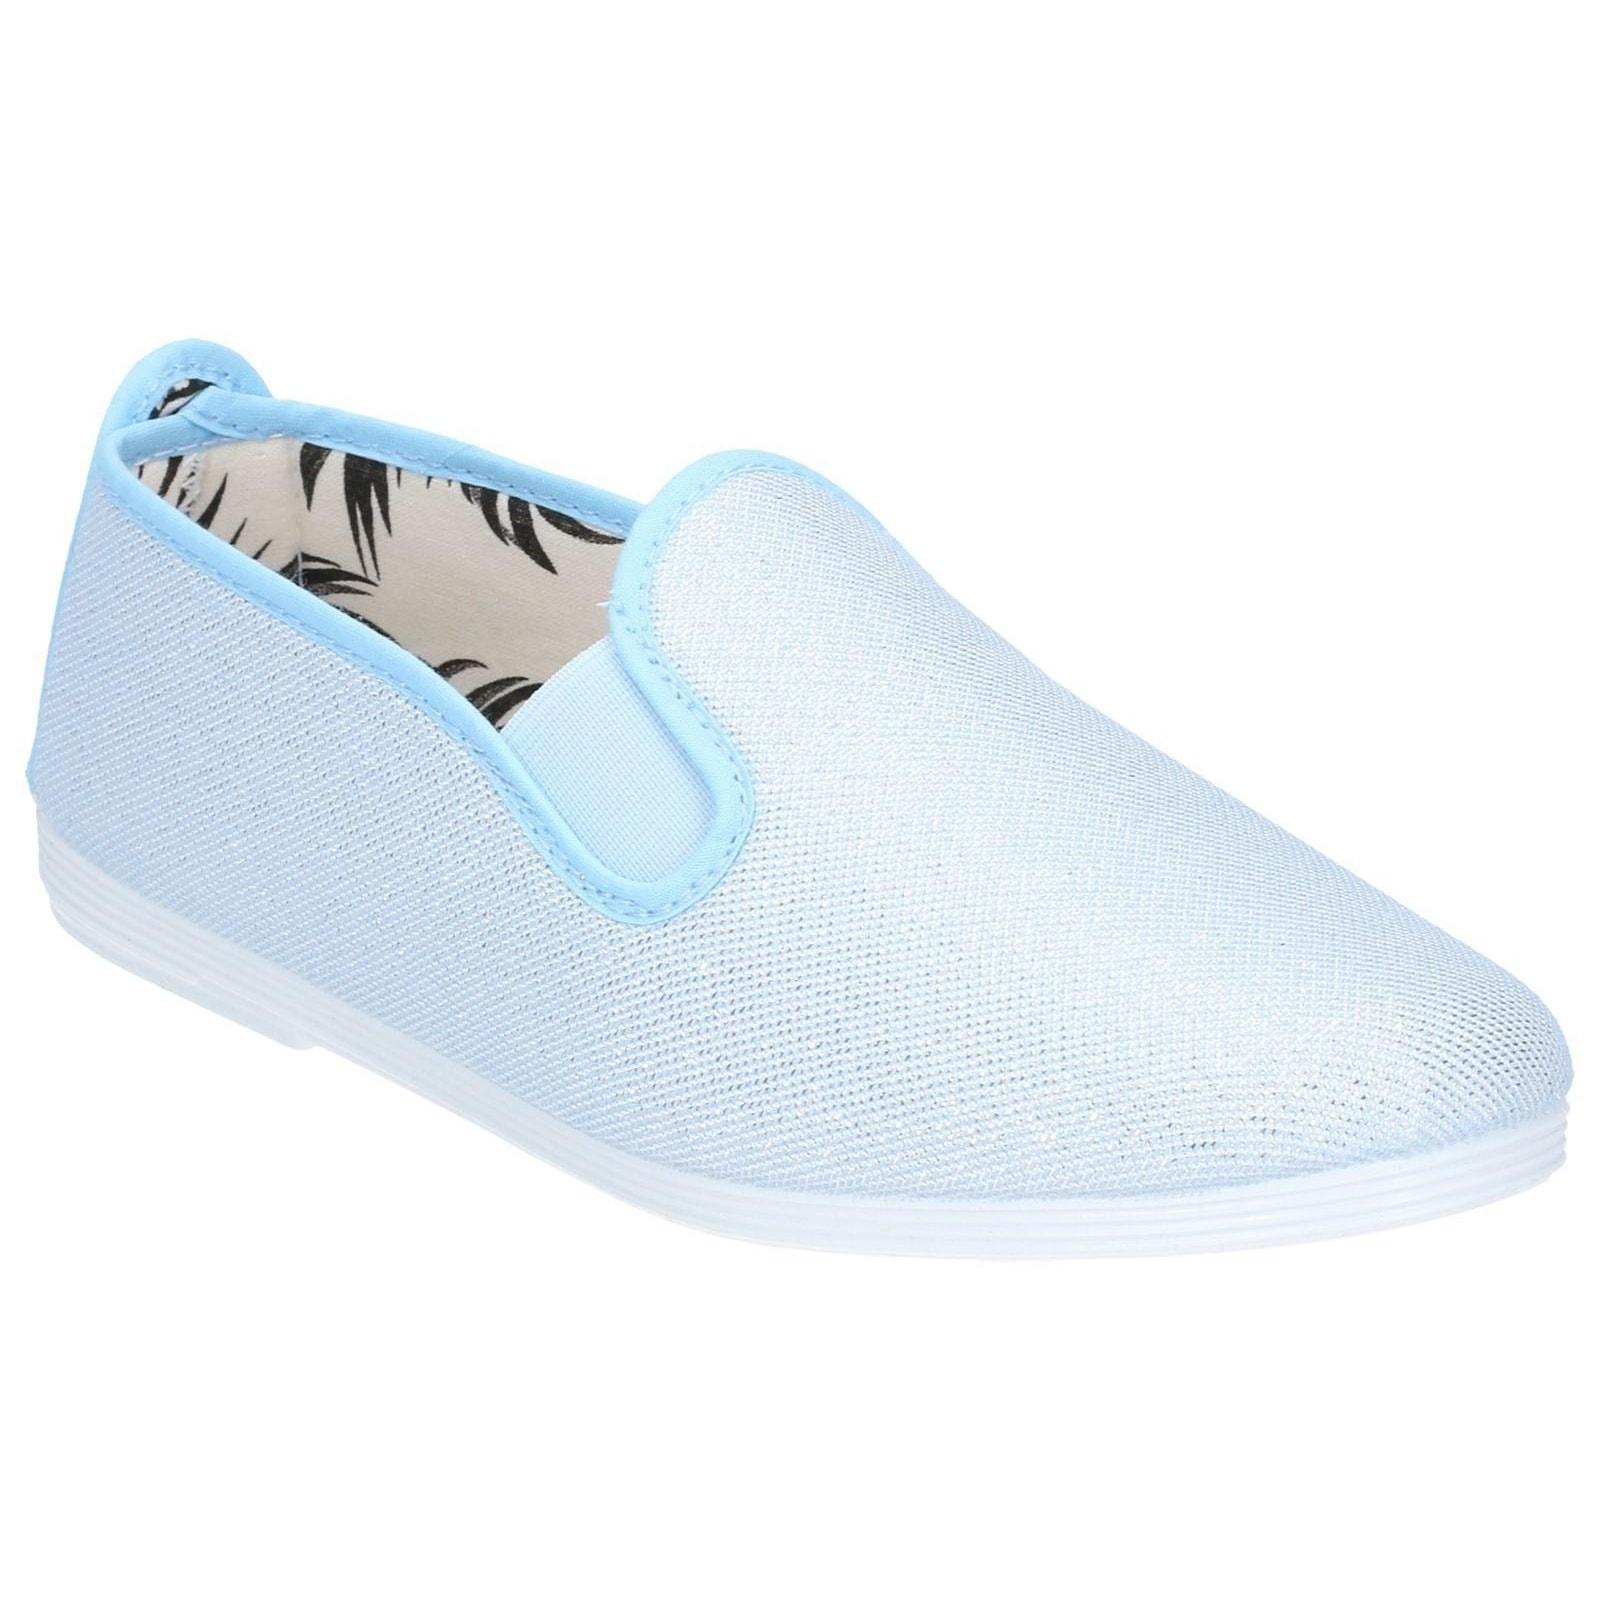 flossy -  Slipper Damen Onda Slip On Schuh